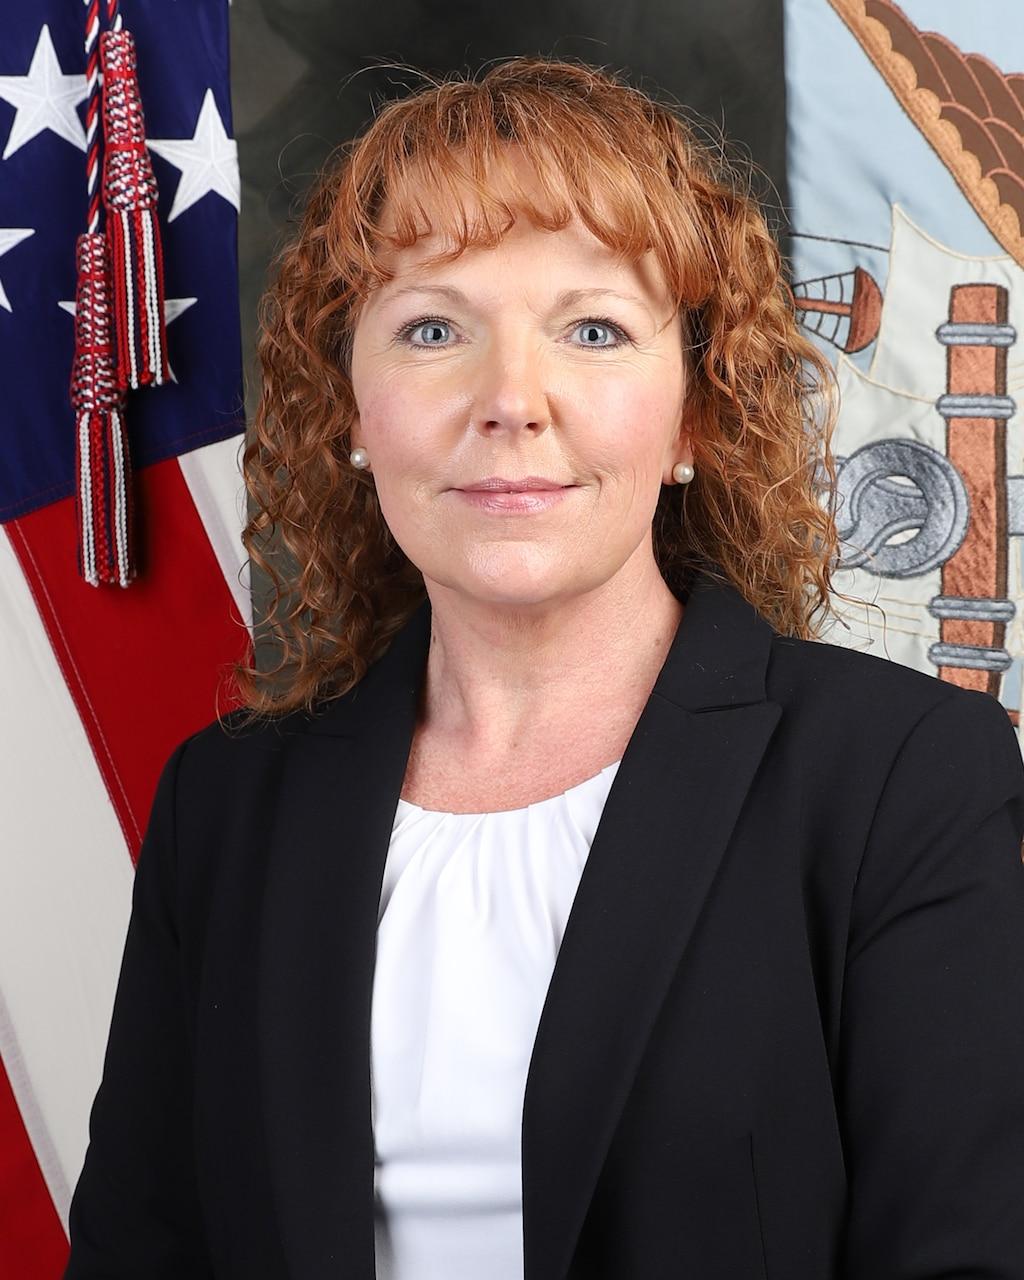 Official Portrait of Ms. Tamara North